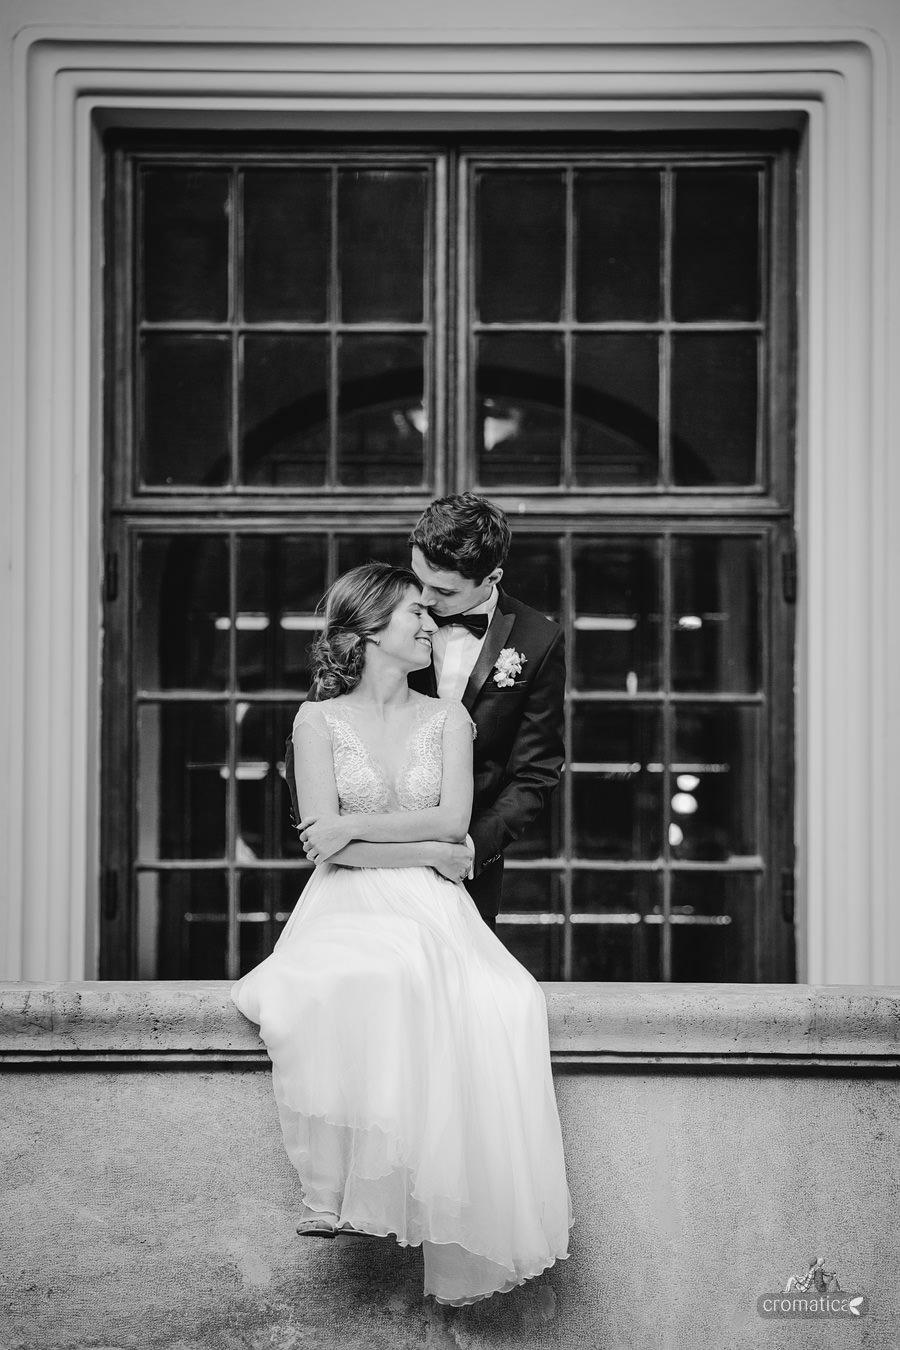 Irina + Florin - Fotografii nunta Bucuresti (26)